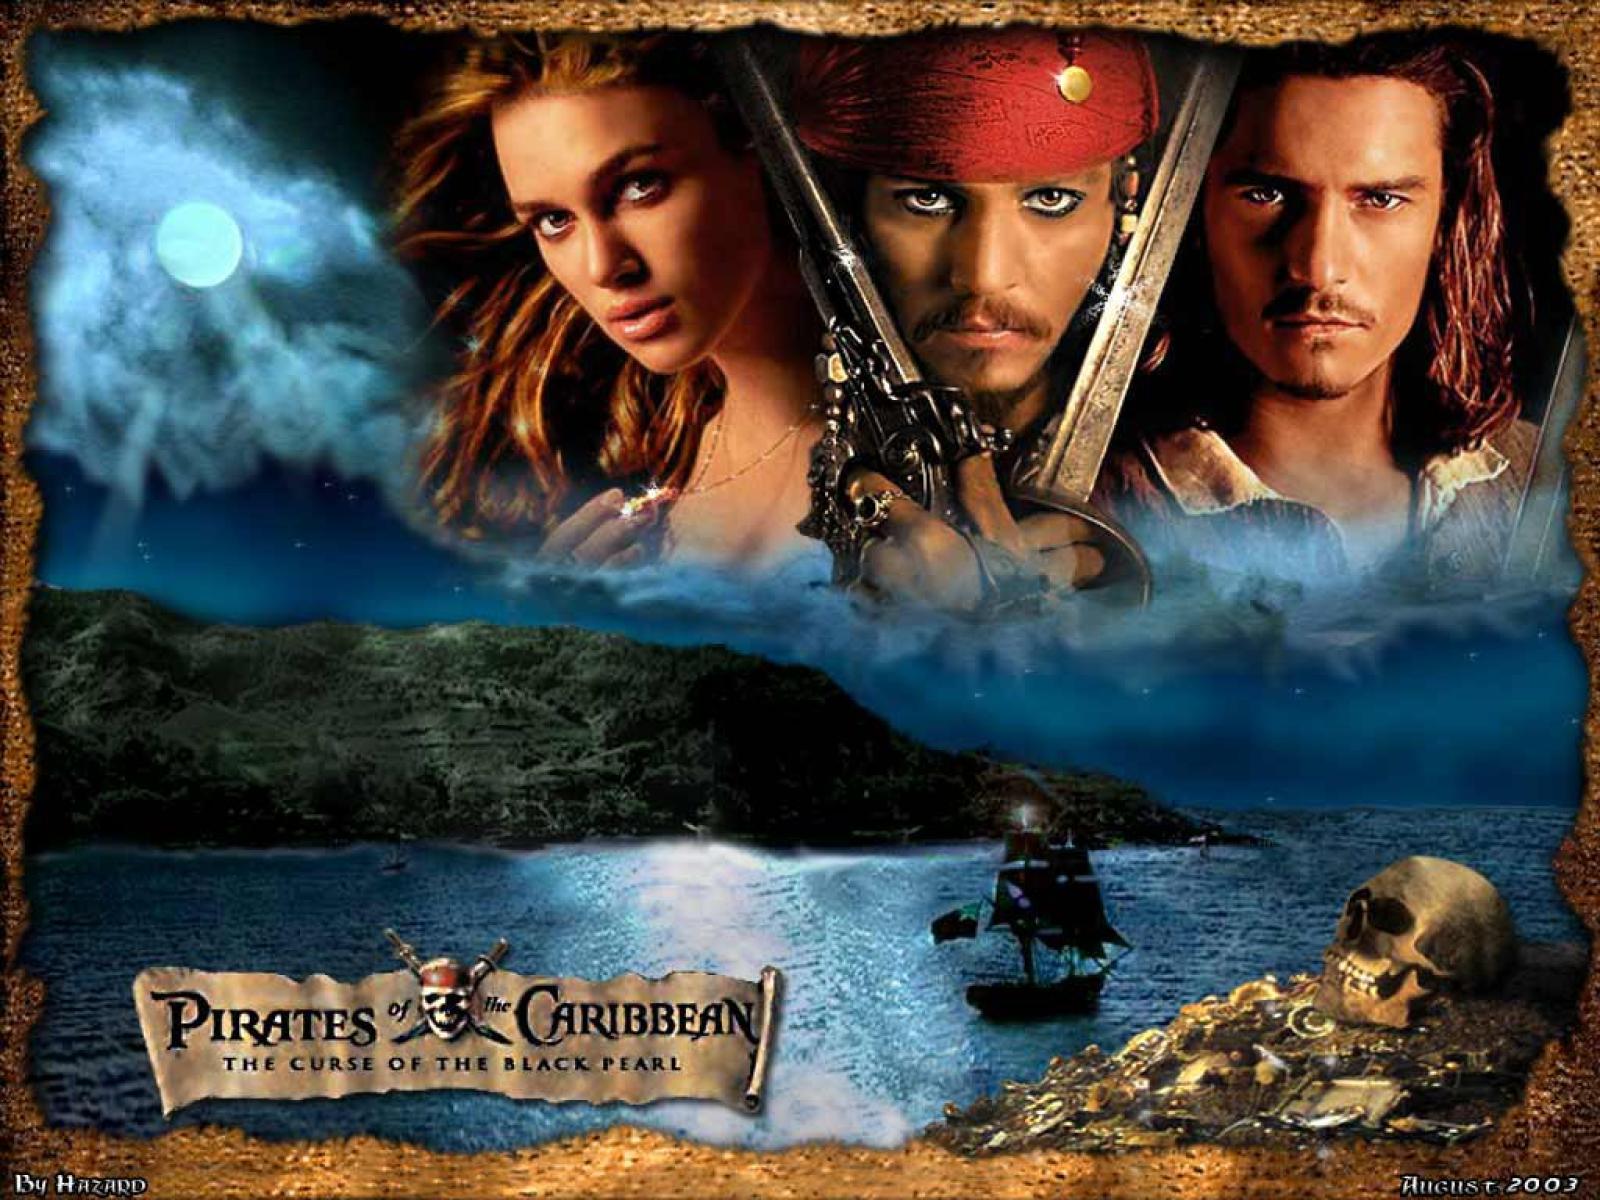 http://www.wallpaper.cz/primo/old_ir/pirati_z_karibiku_1--c1600xc1200.jpg